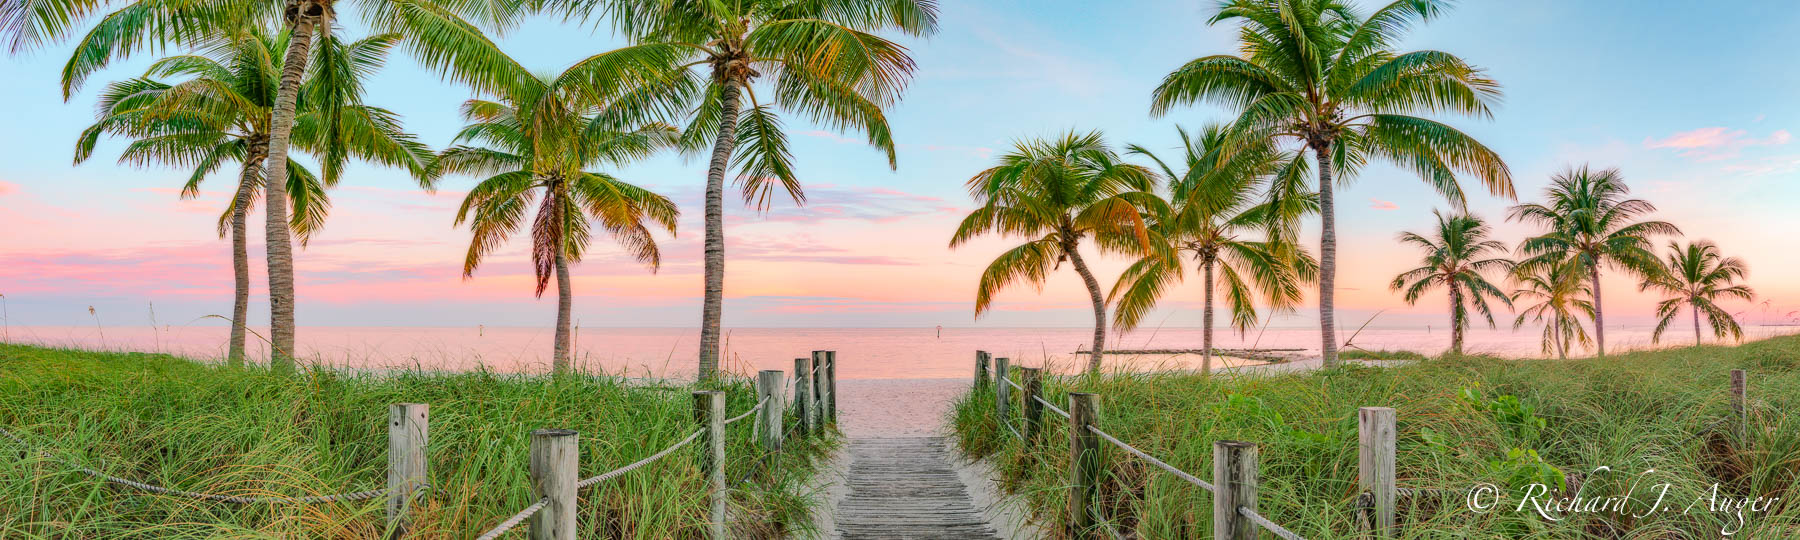 Smather's Beach, Key West, Florida, Ocean, Nautical, Palm Trees, Photograph, Panorama, Photography, Richard Auger